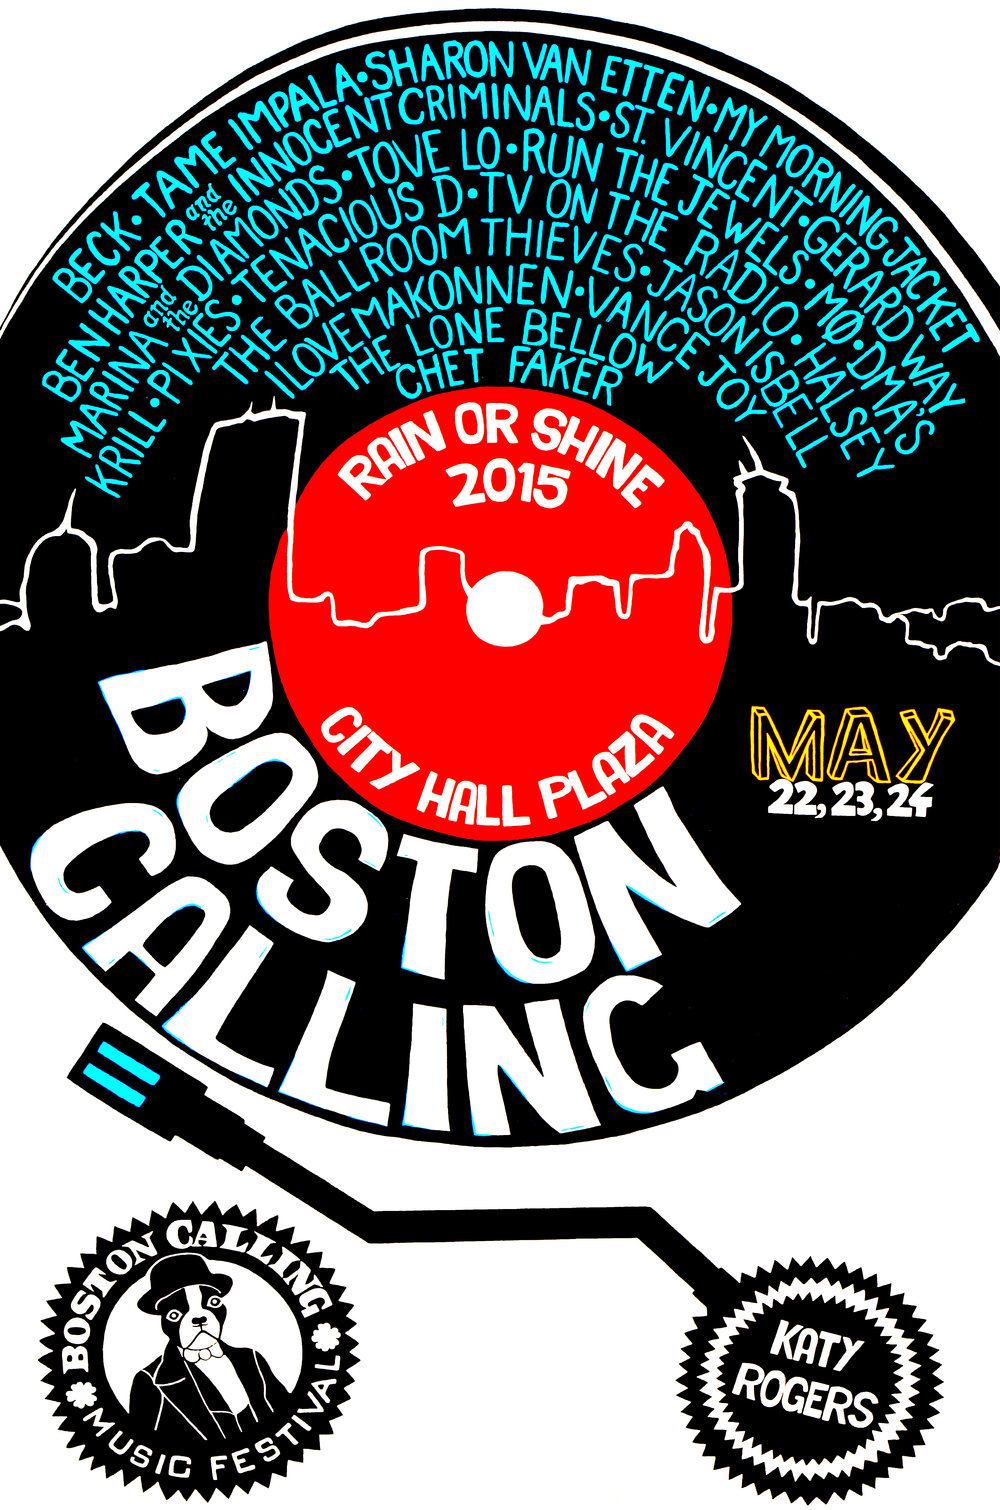 bostoncalling.jpg